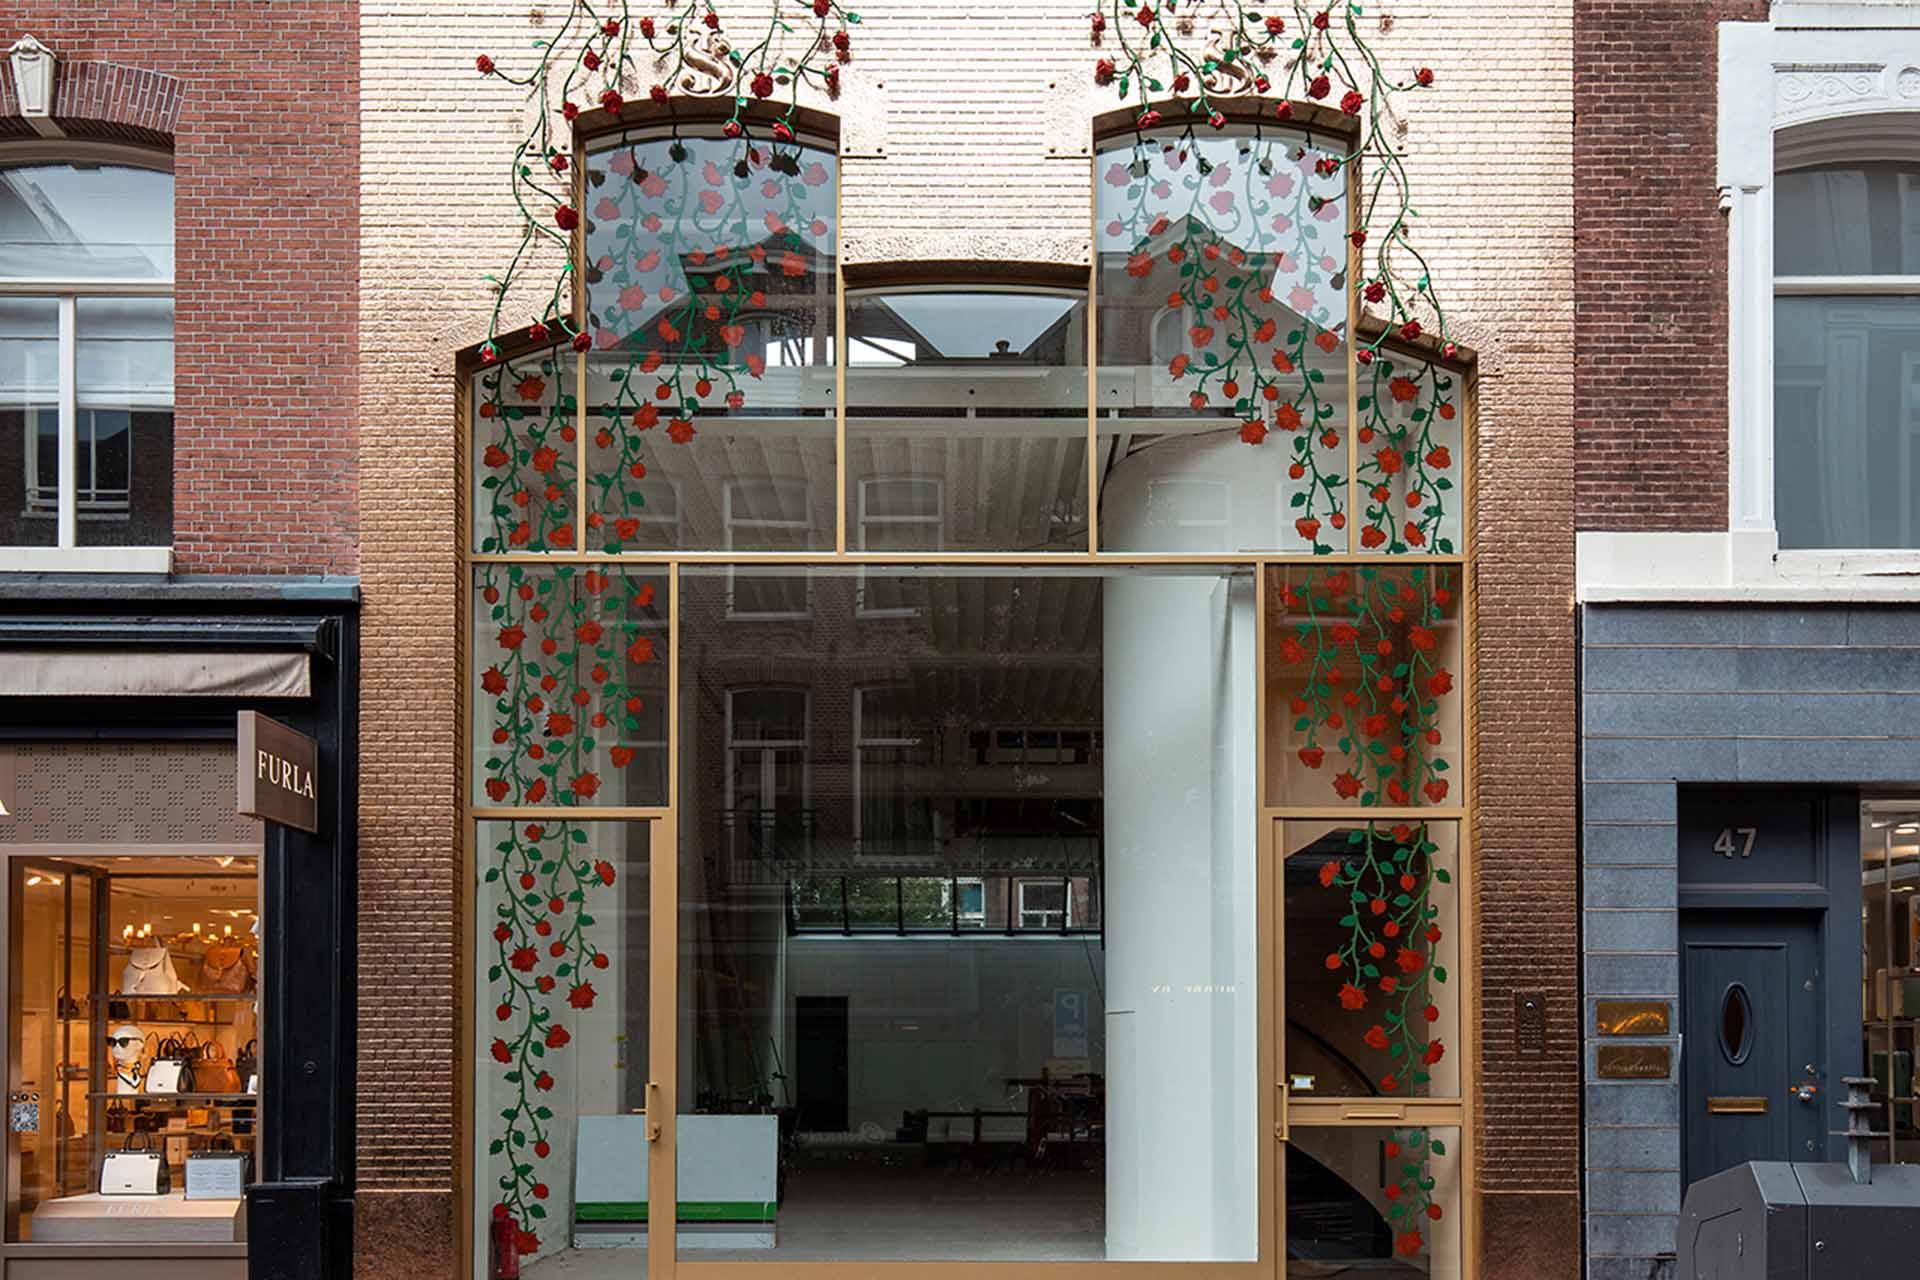 MHB-SL30-ISO-2020-PV-P.C.-Hooftstraat-45-Amsterdam-1-23